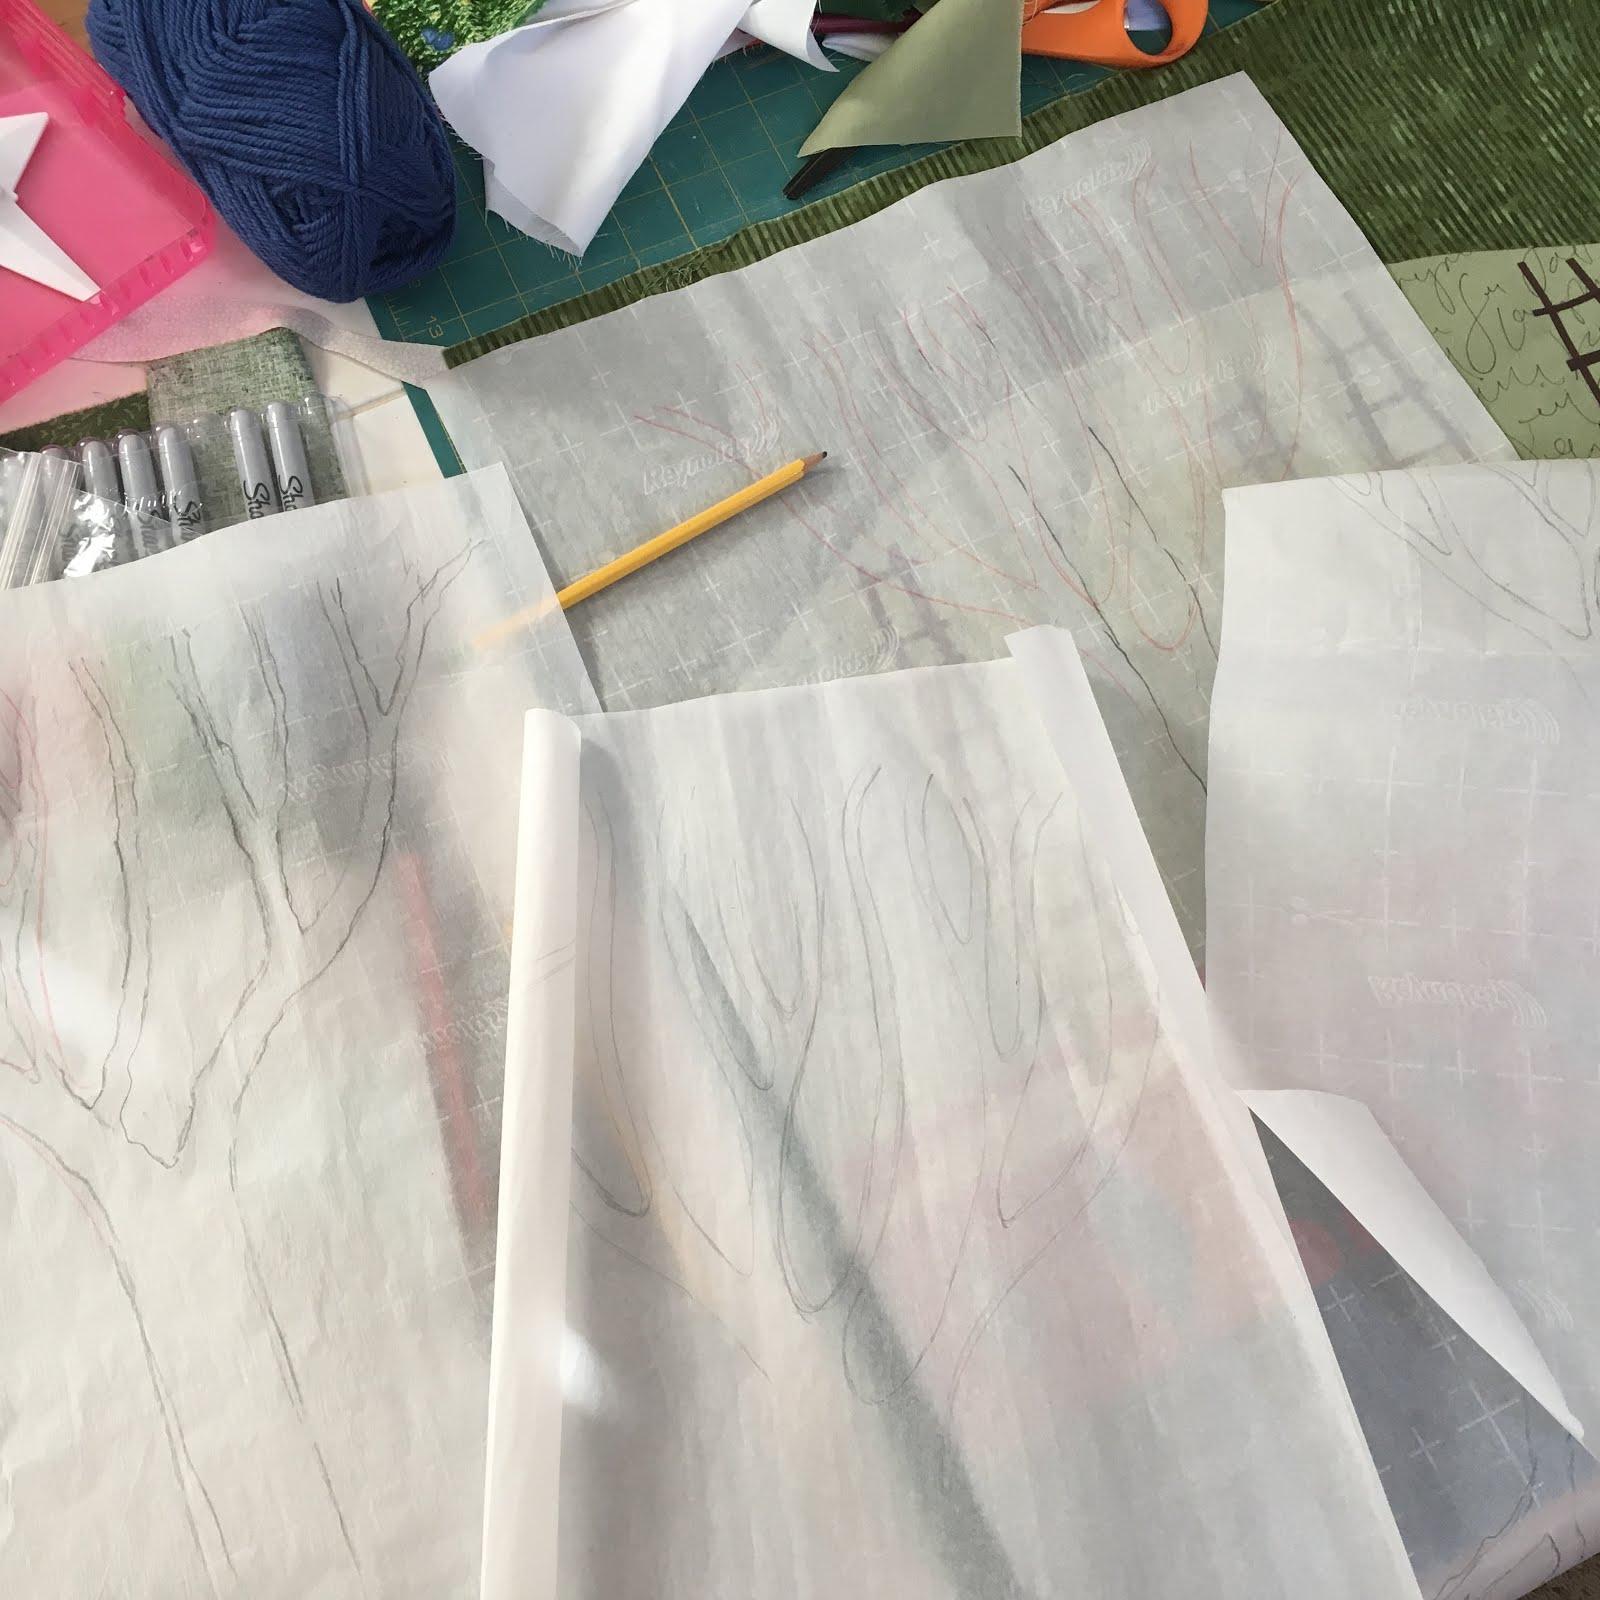 Deborah's Journal: Step by Step Creative Process